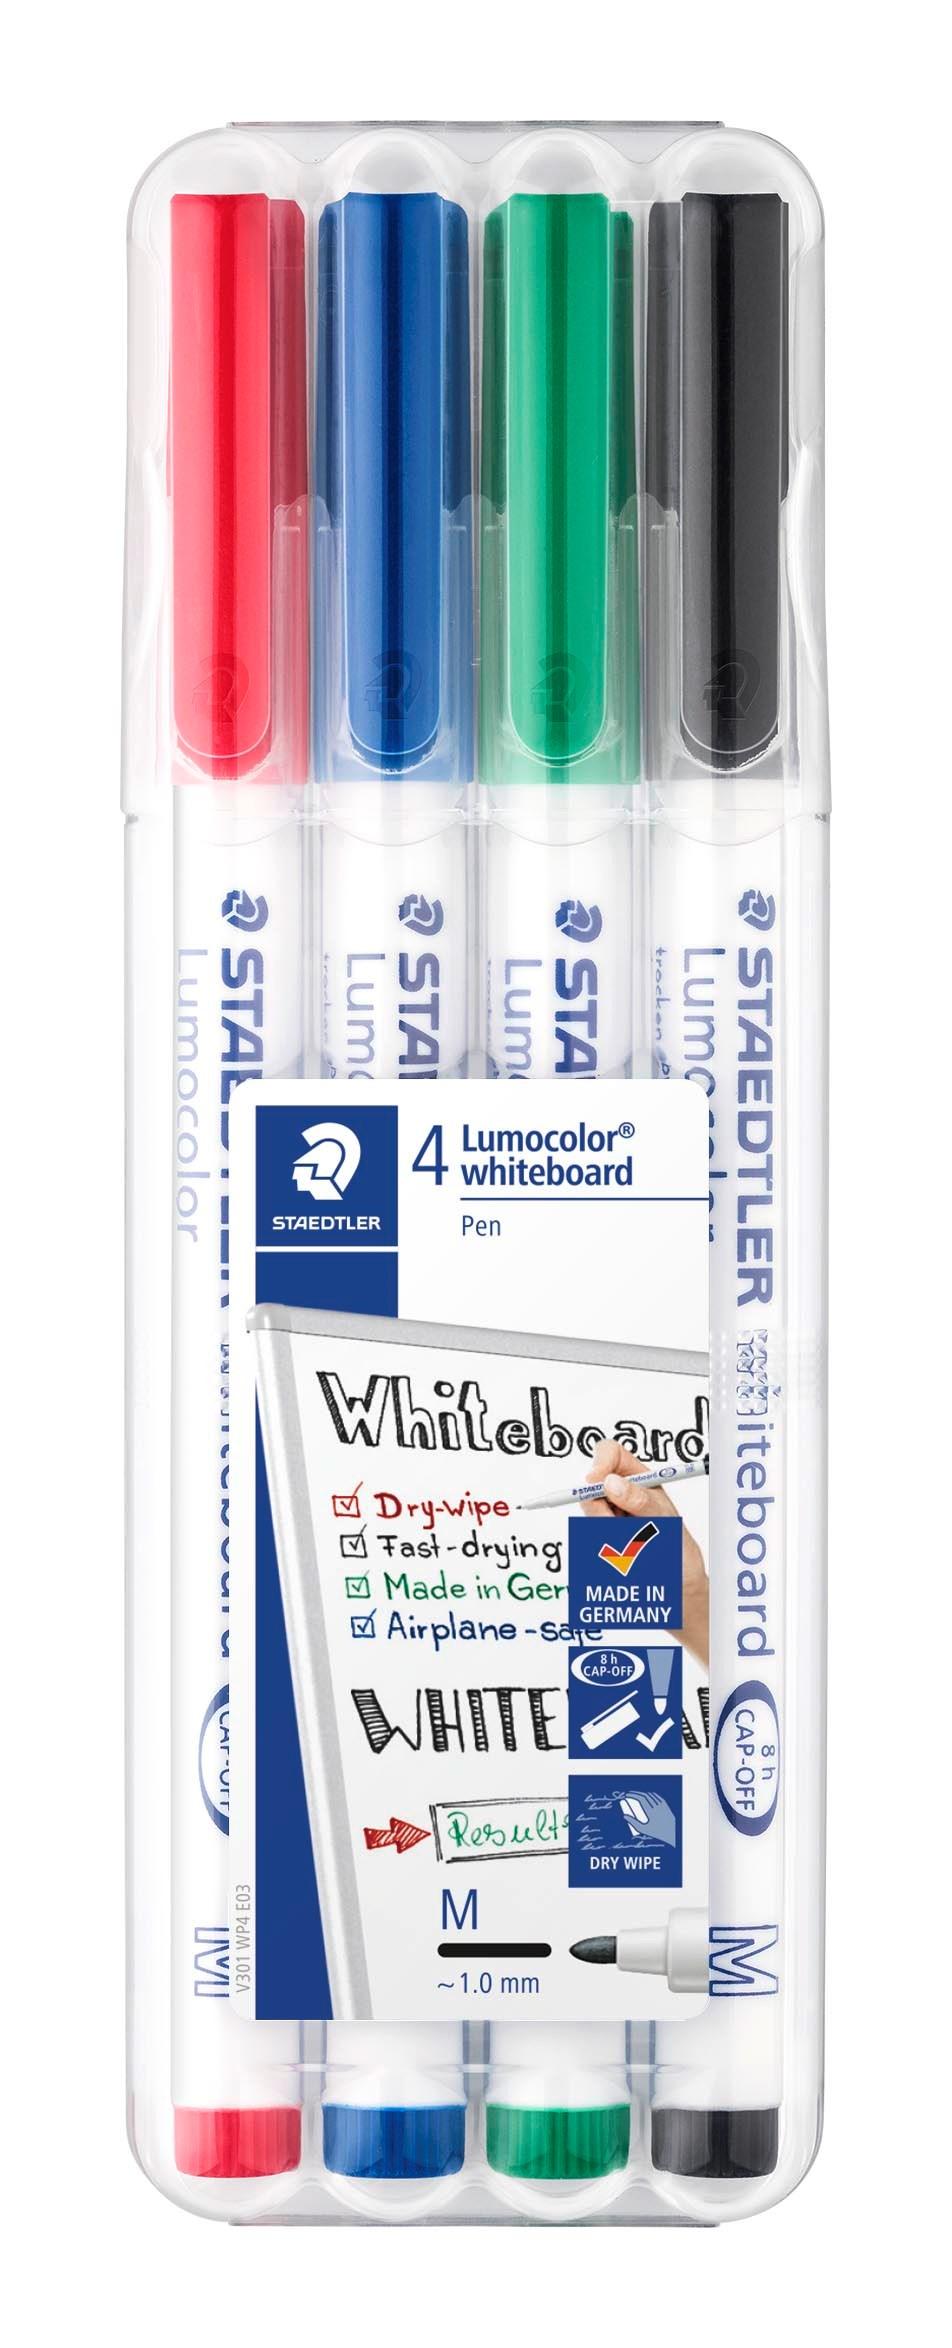 WB Marker Lumocolor rund 1mm ass (4)